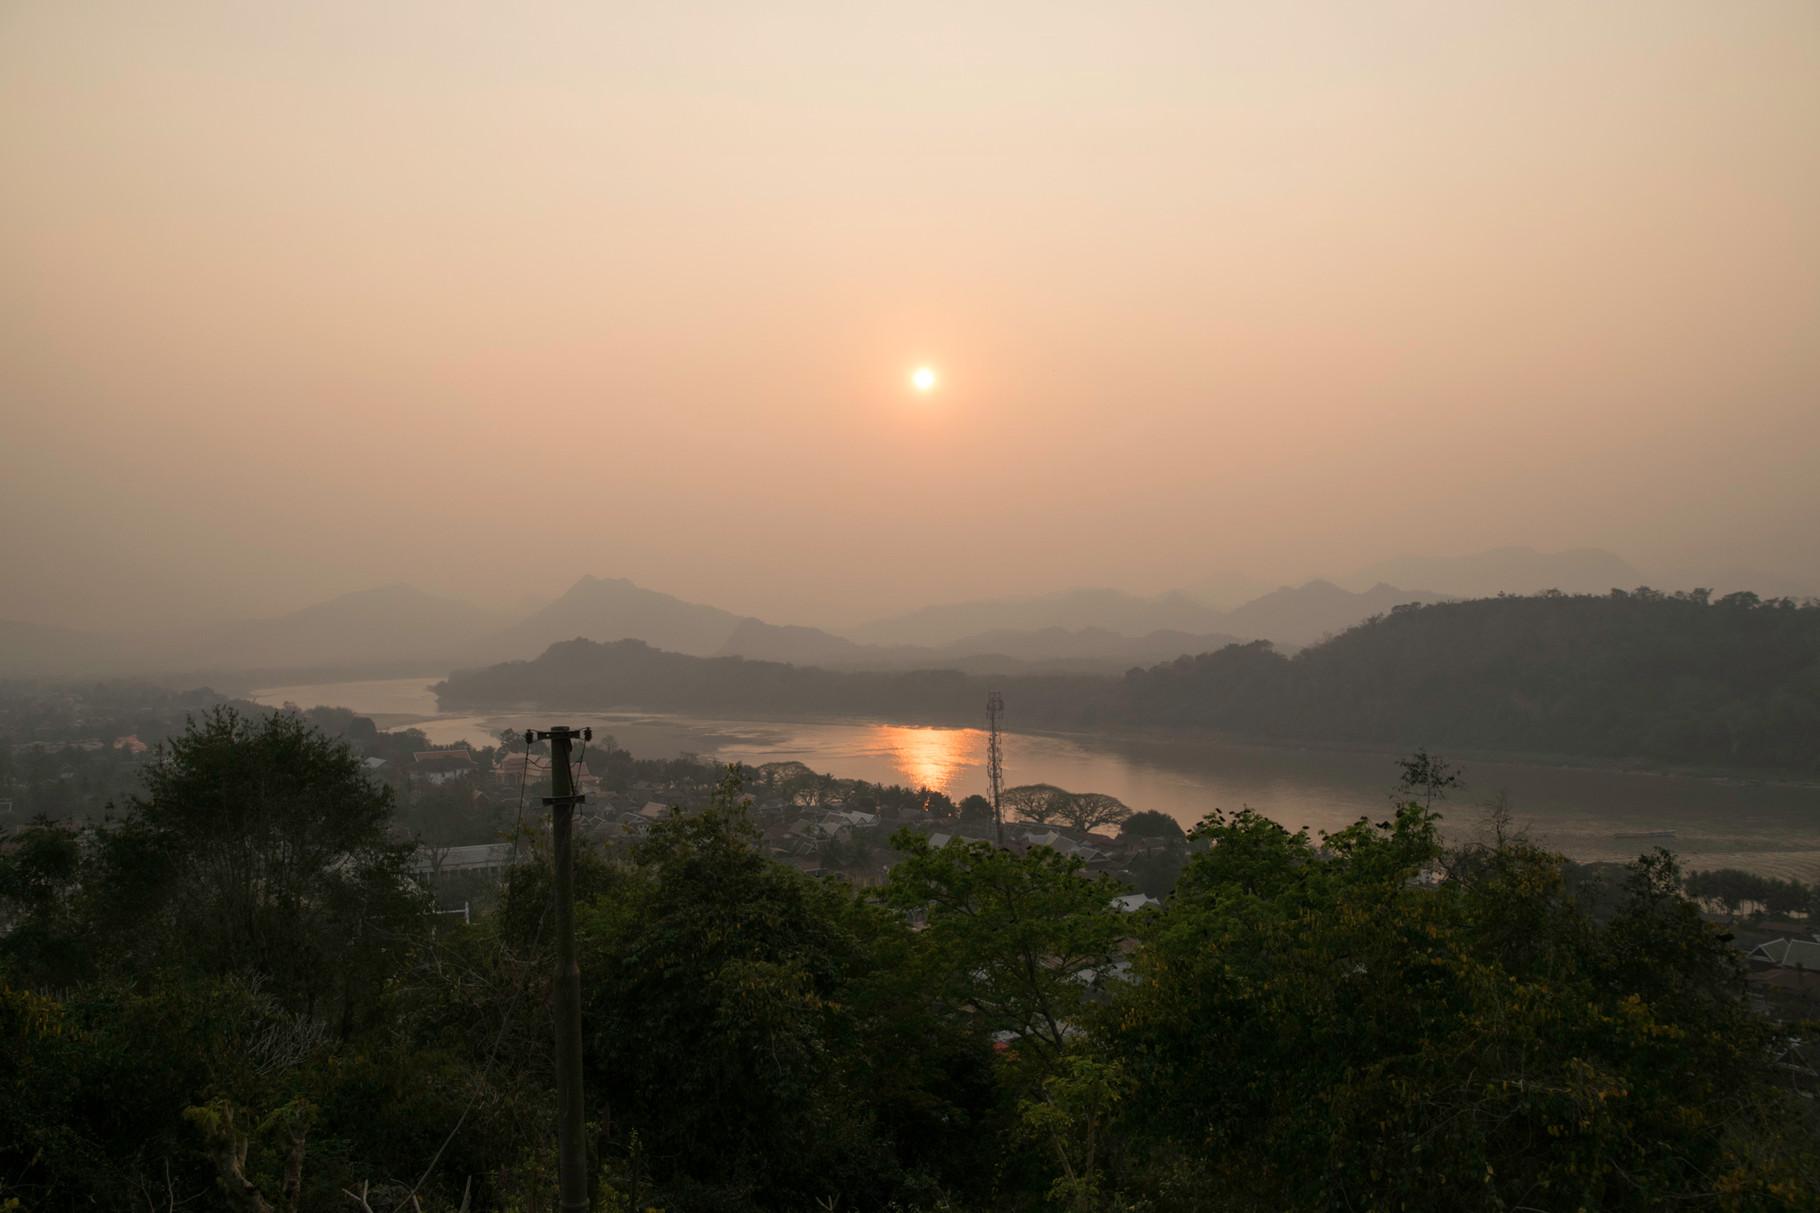 Sonnenuntergang auf dem Tempelberg von Luang Prabang